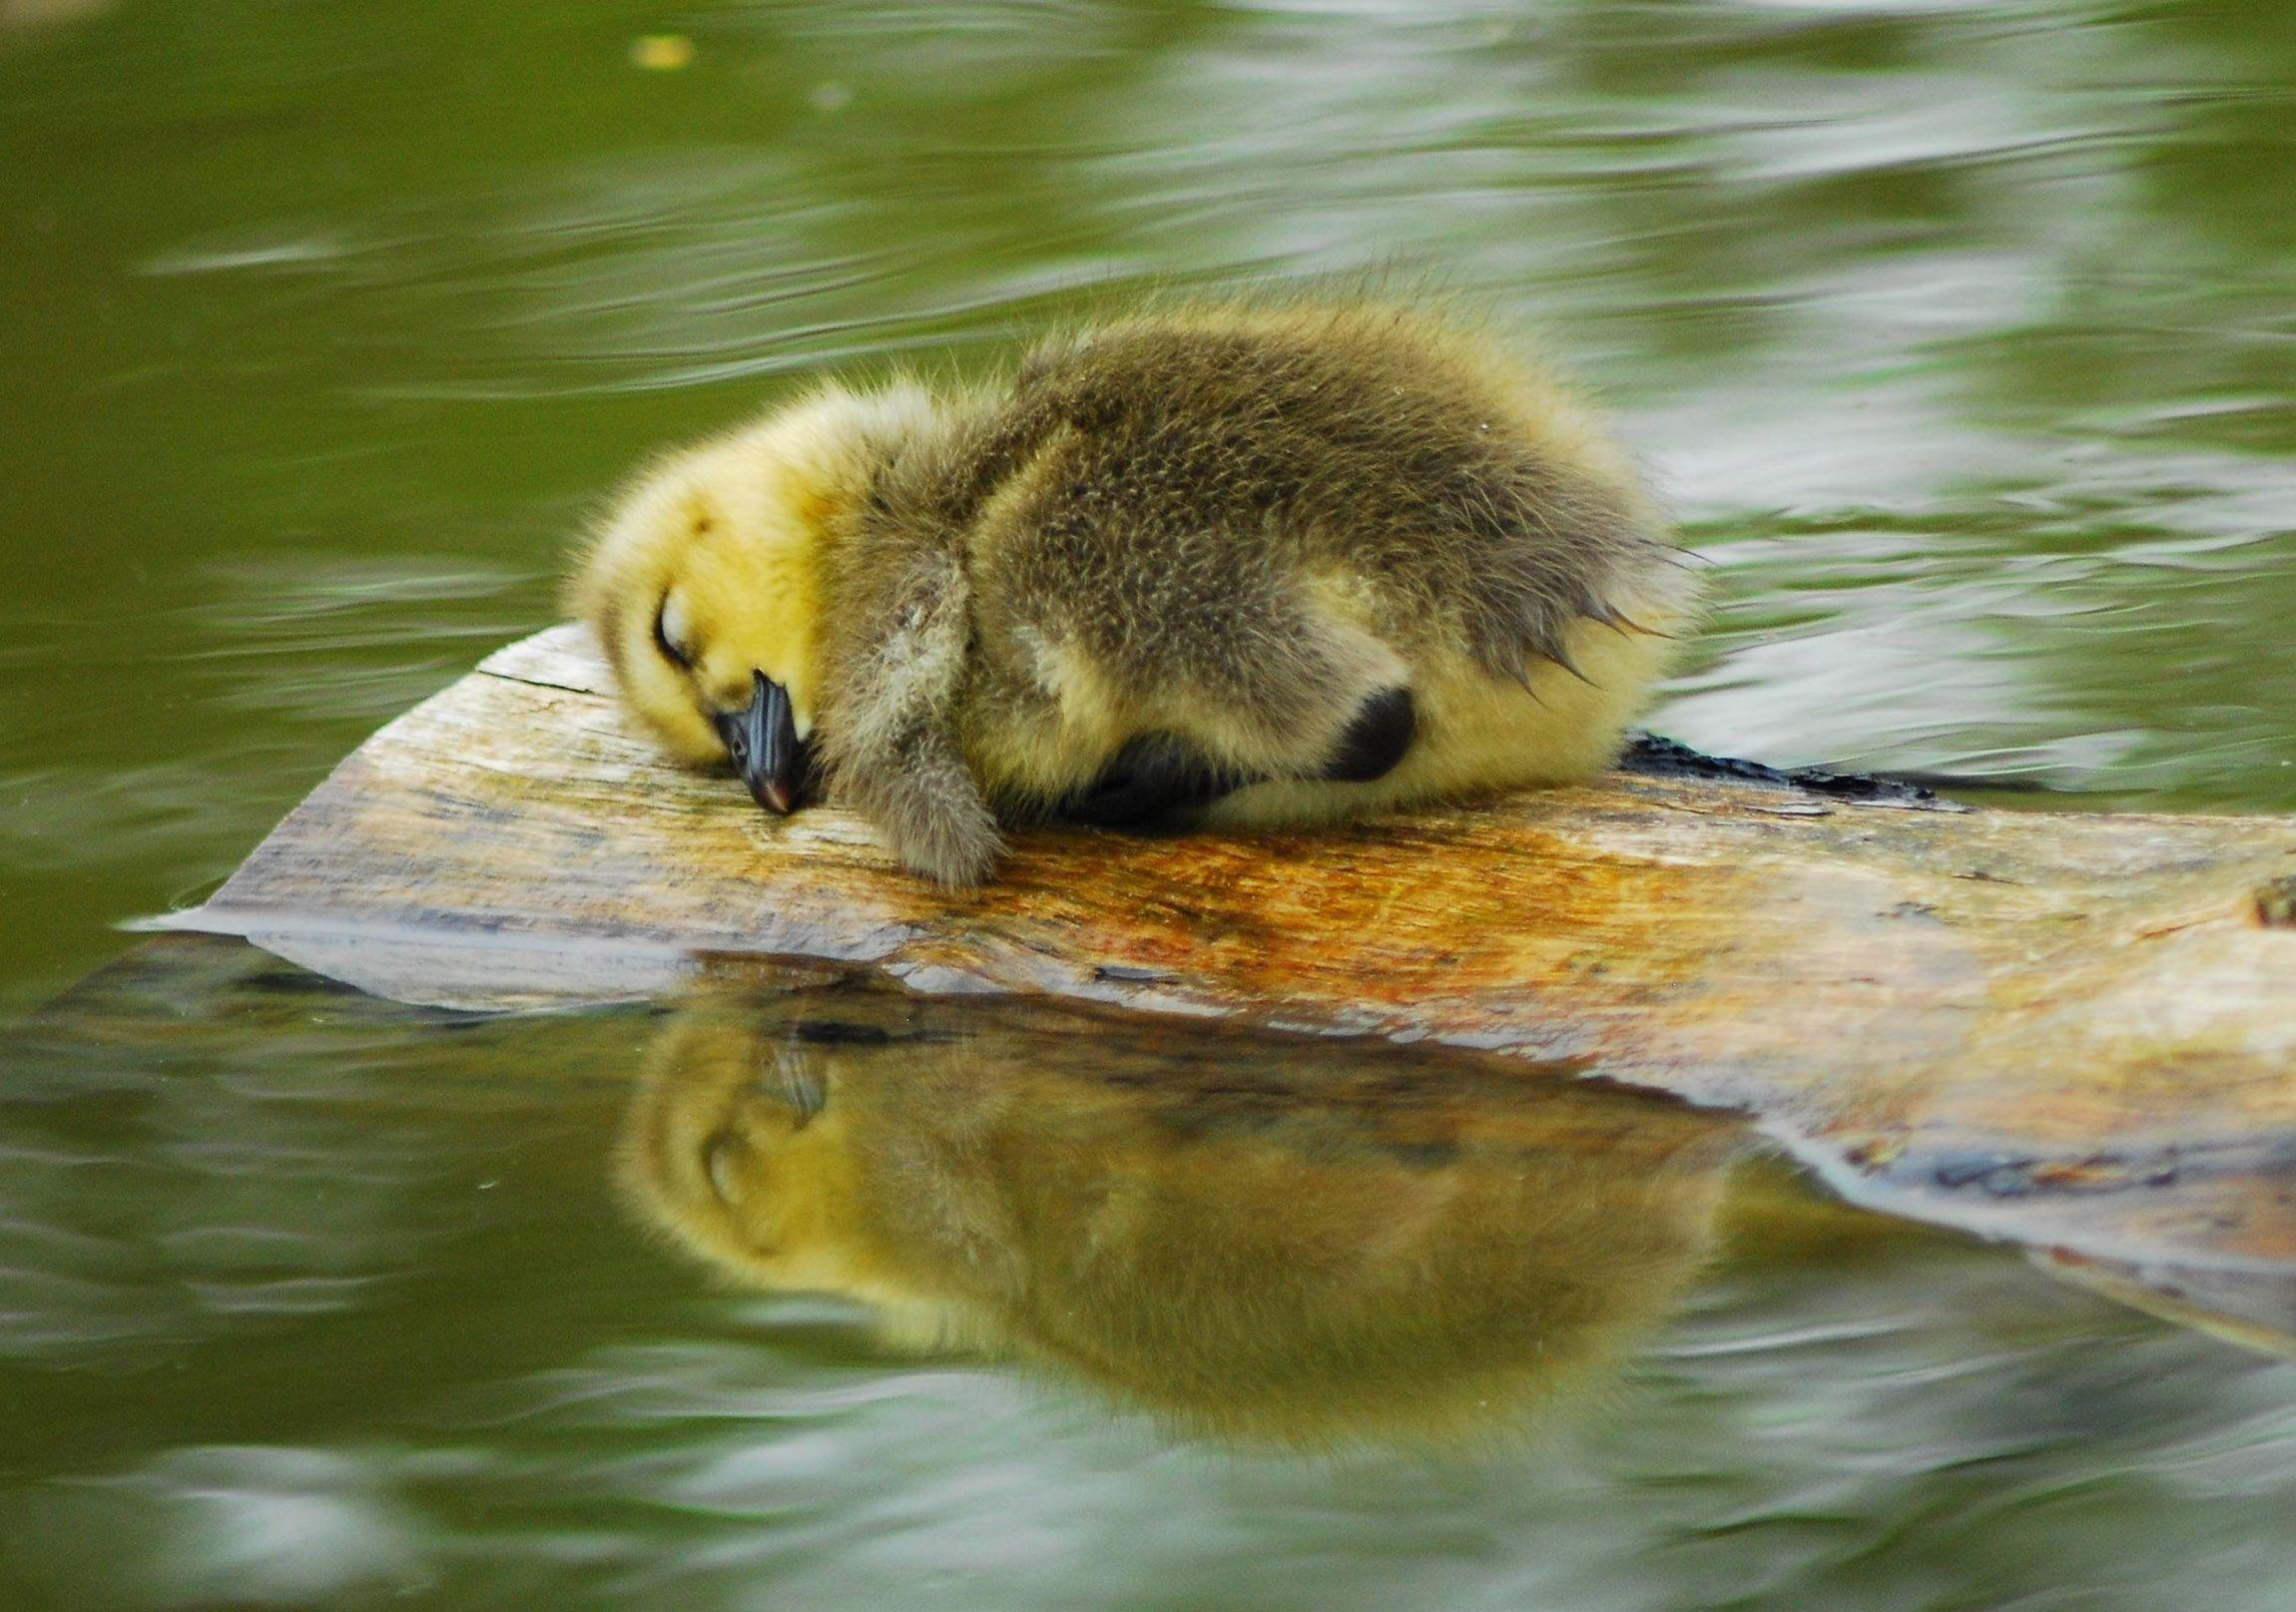 Adorable sleeping duckling cute animals animals cute